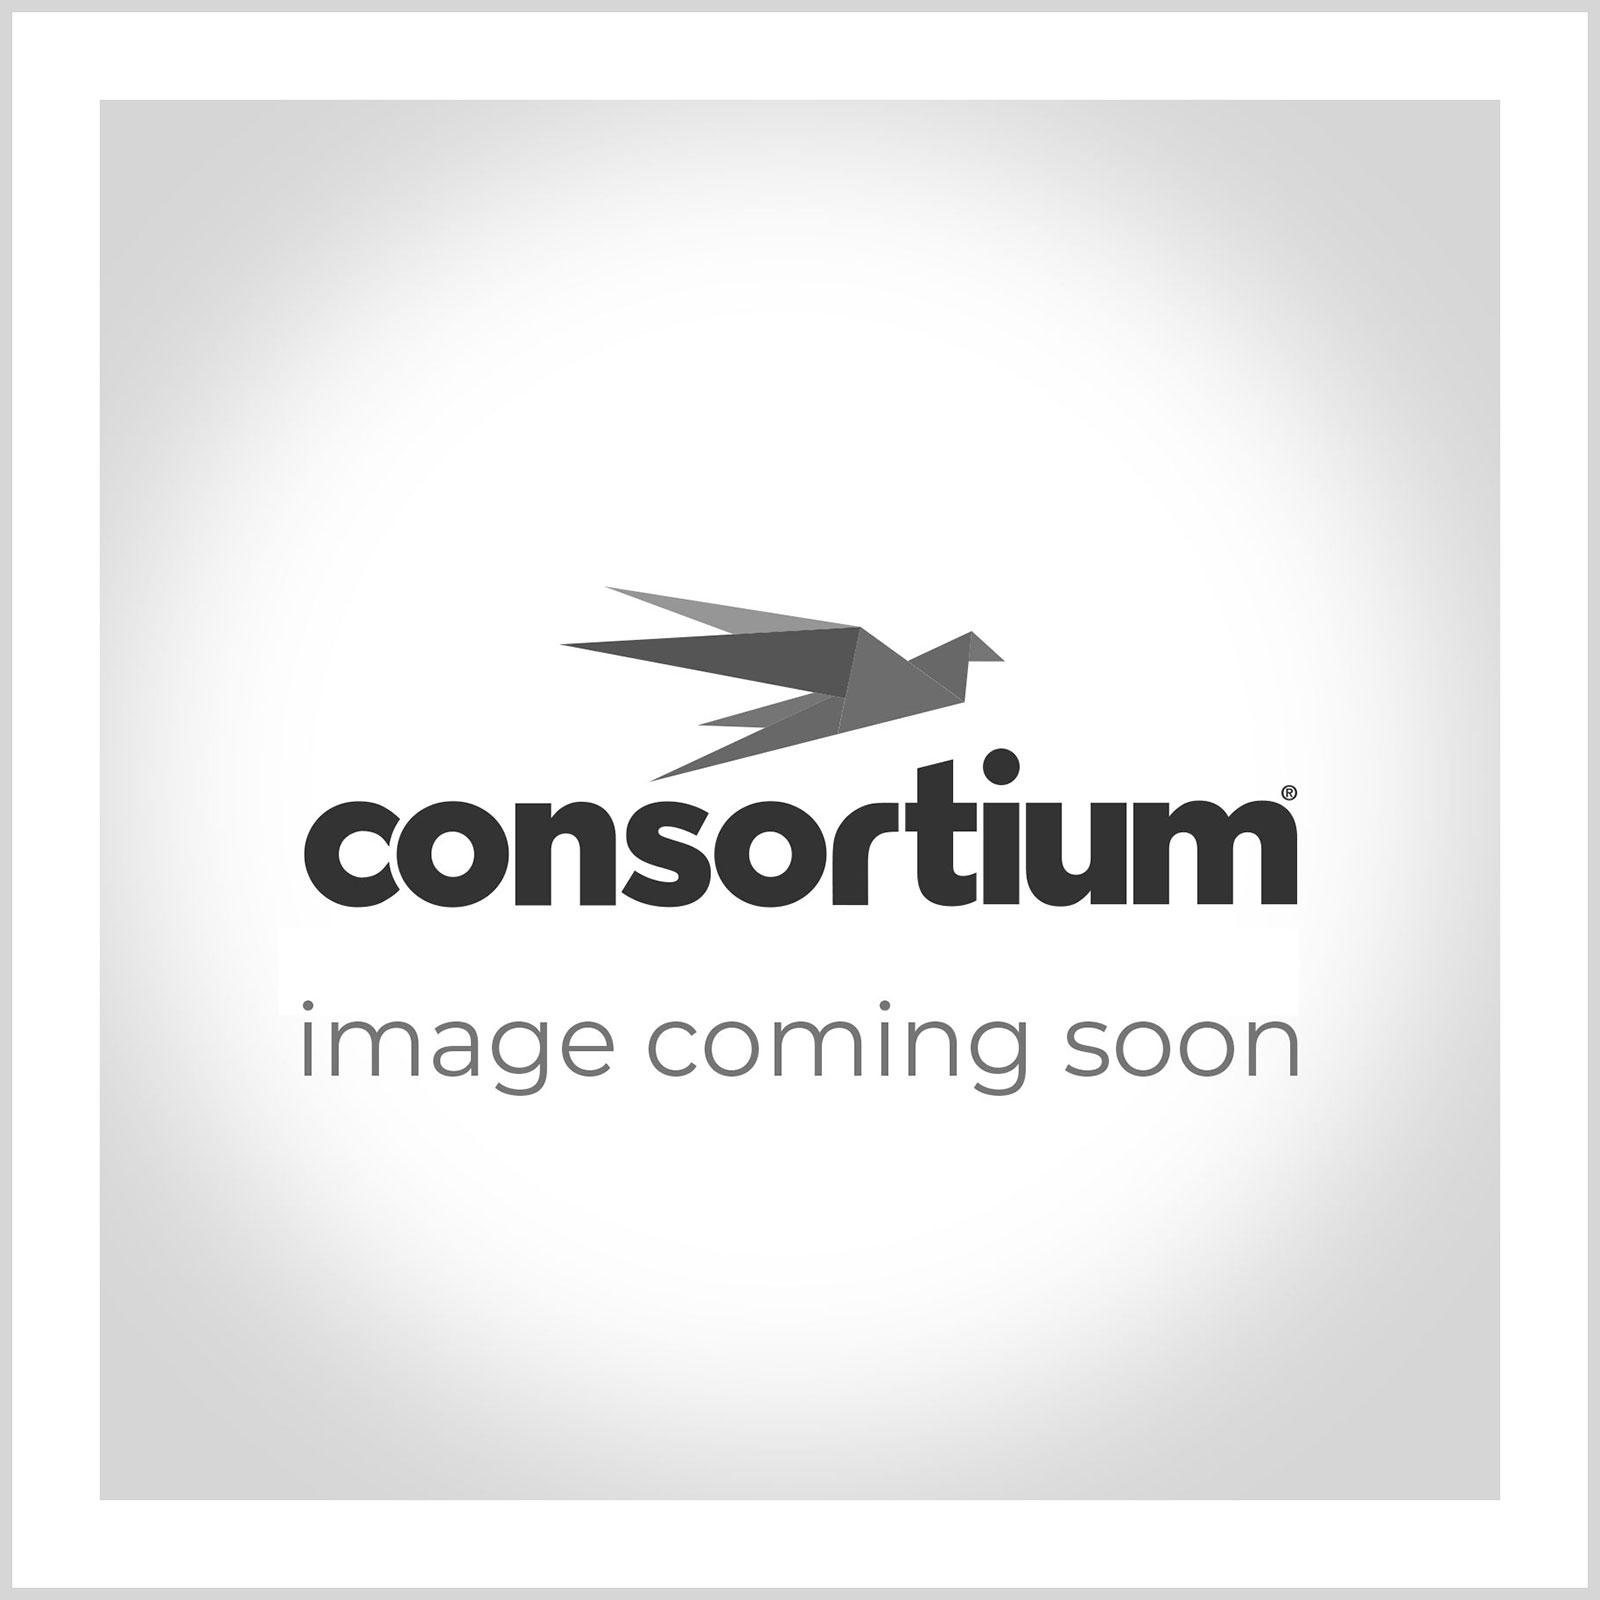 Consortium Gym kit